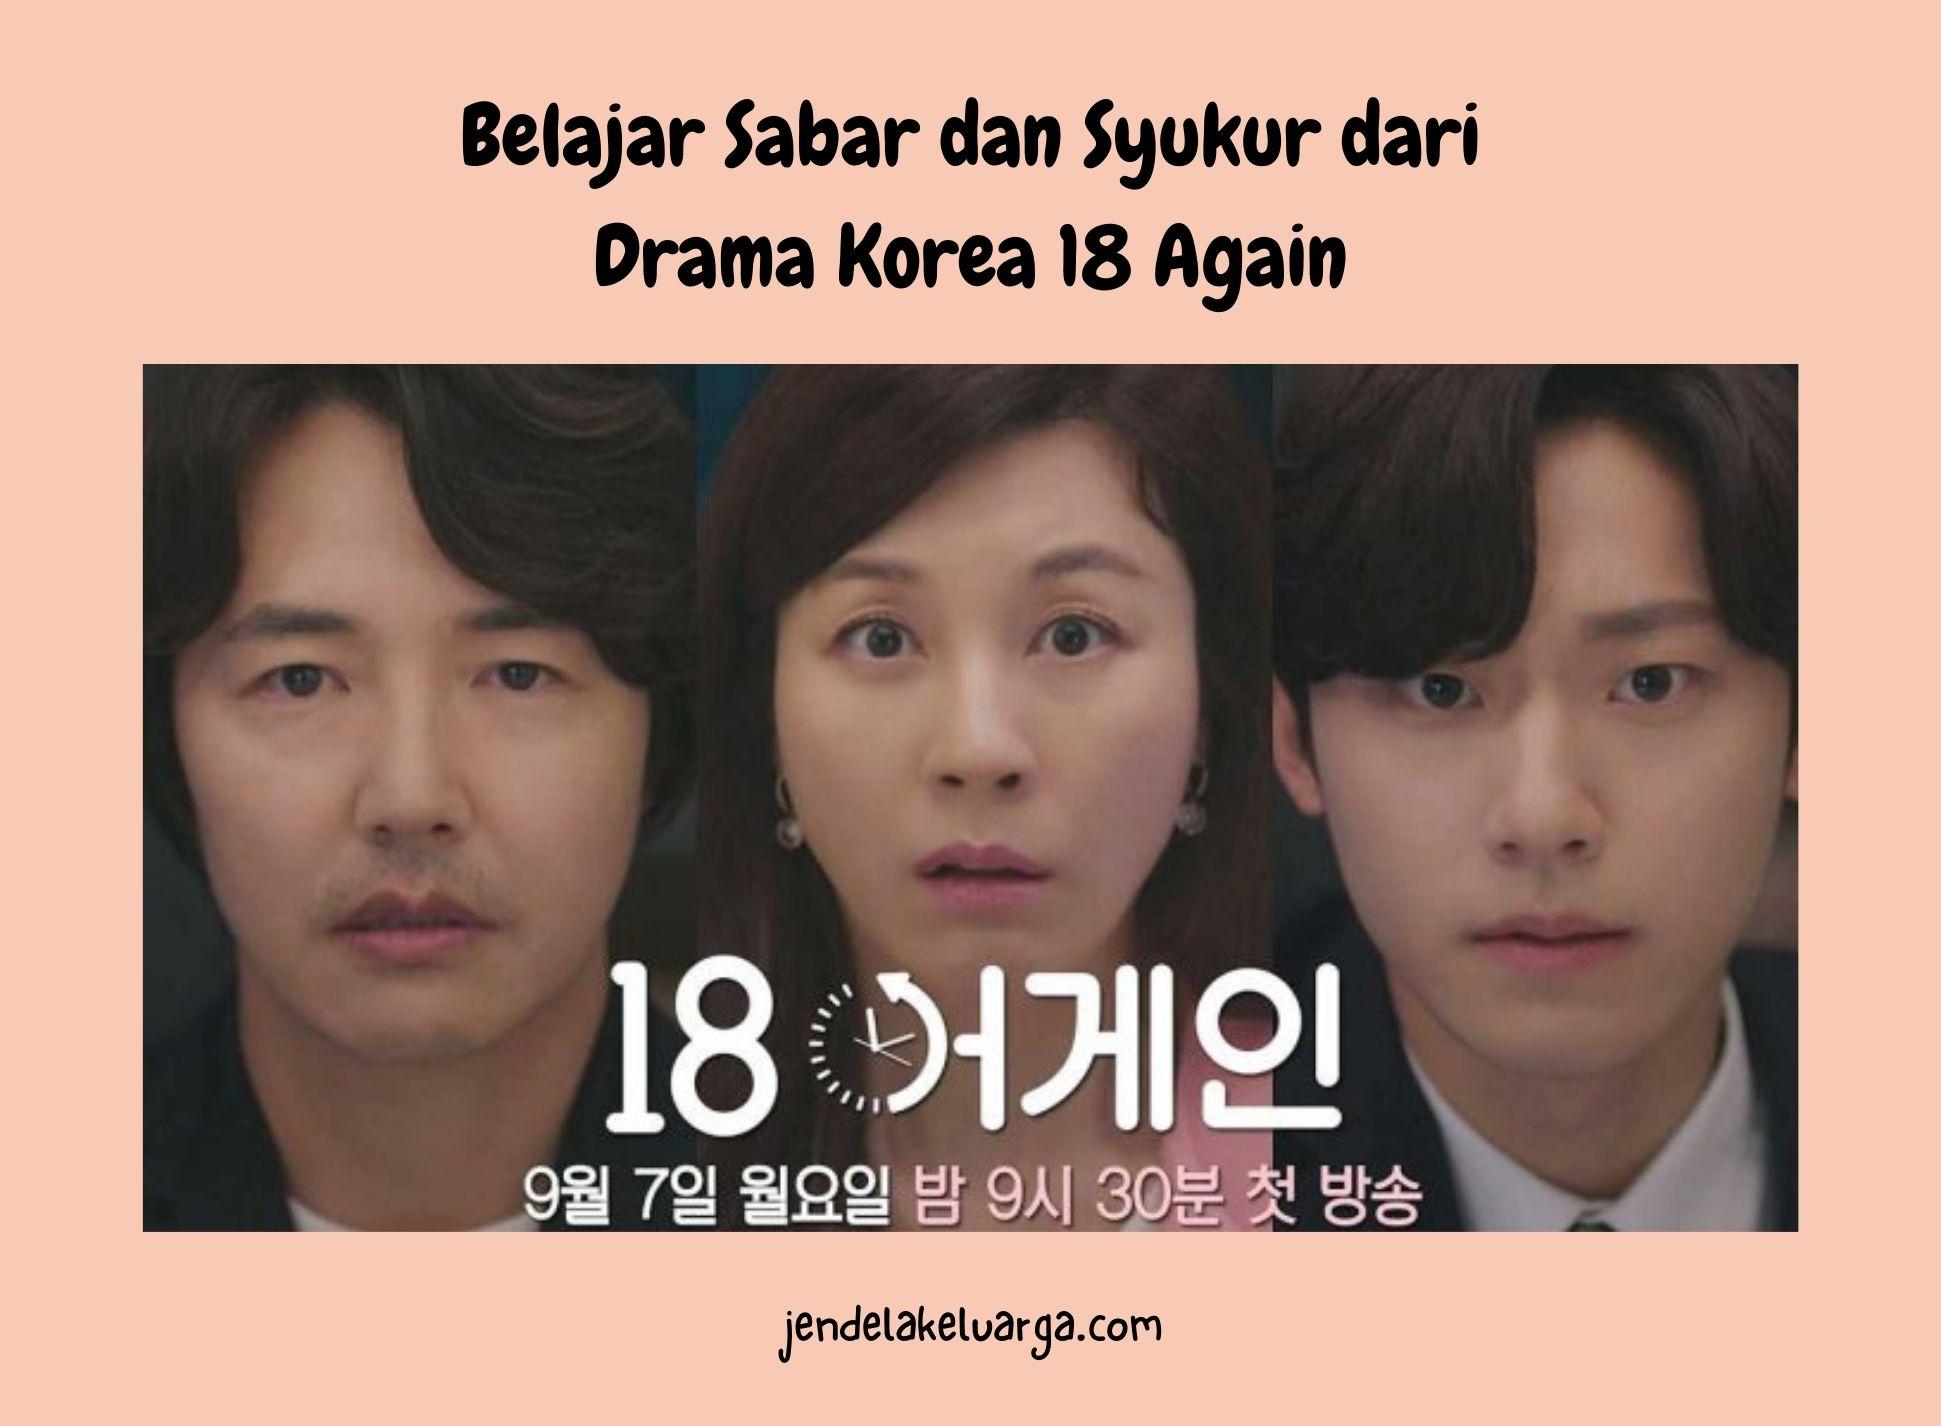 Belajar Sabar dan Syukur dari Drama Korea 18 Again